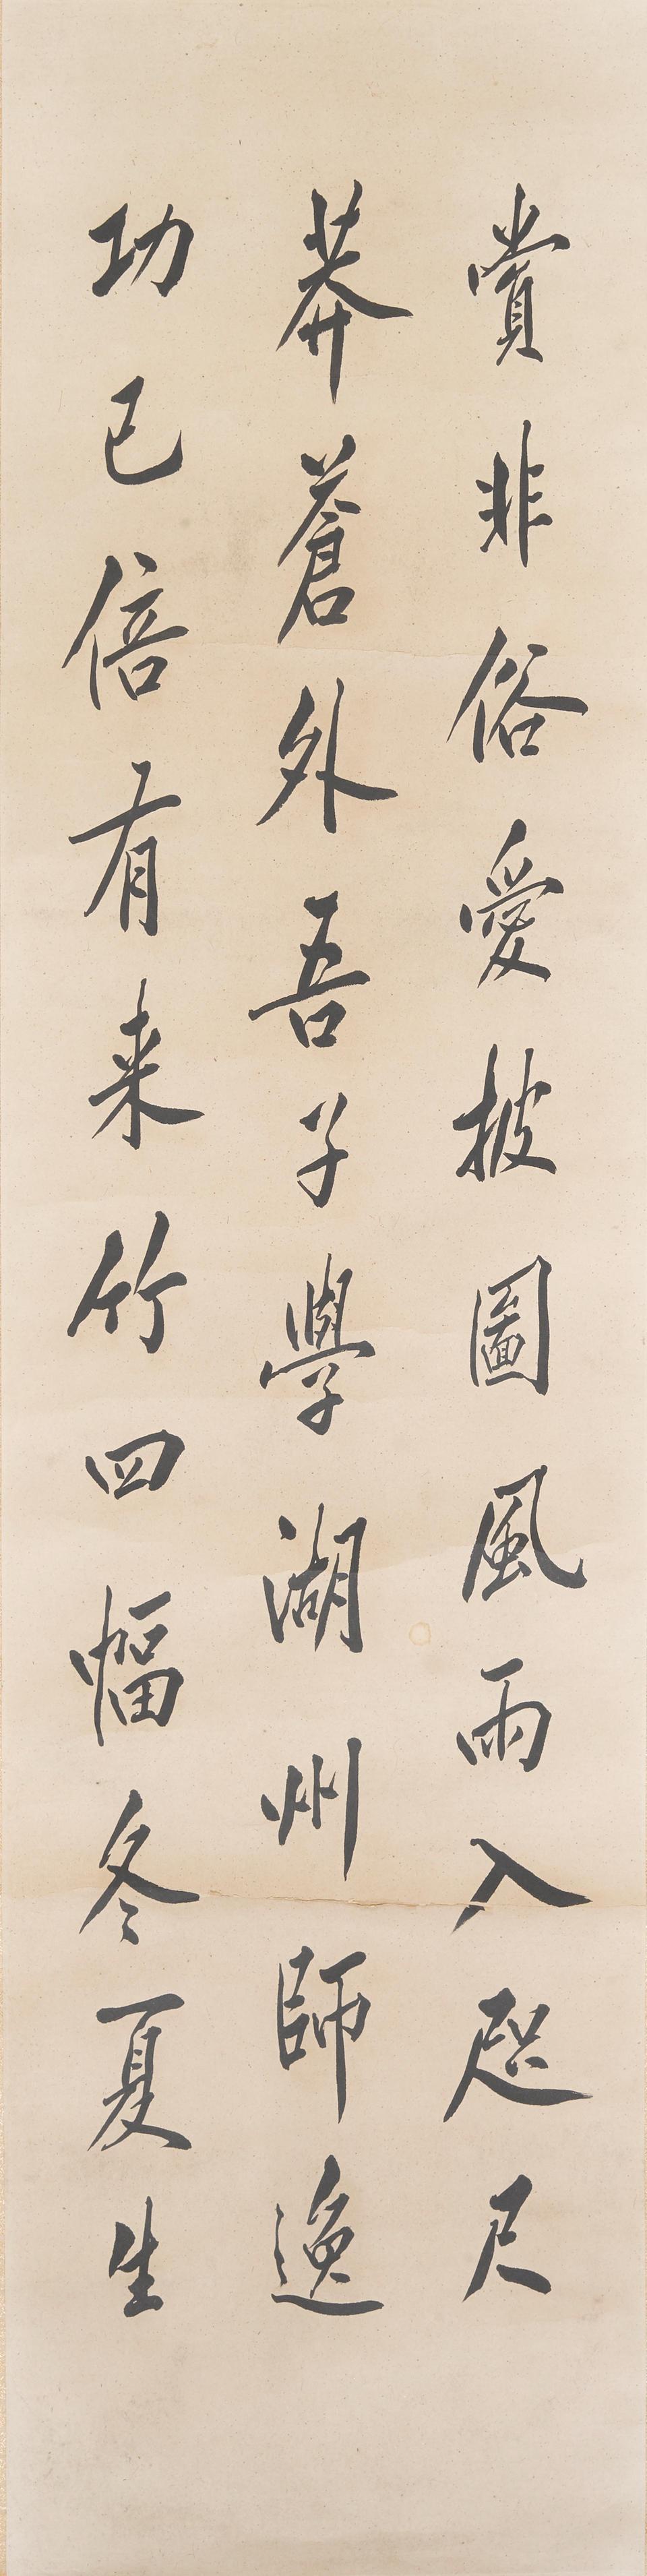 Chen Baochen (1848-1935)  A set of four calligraphy in Running script